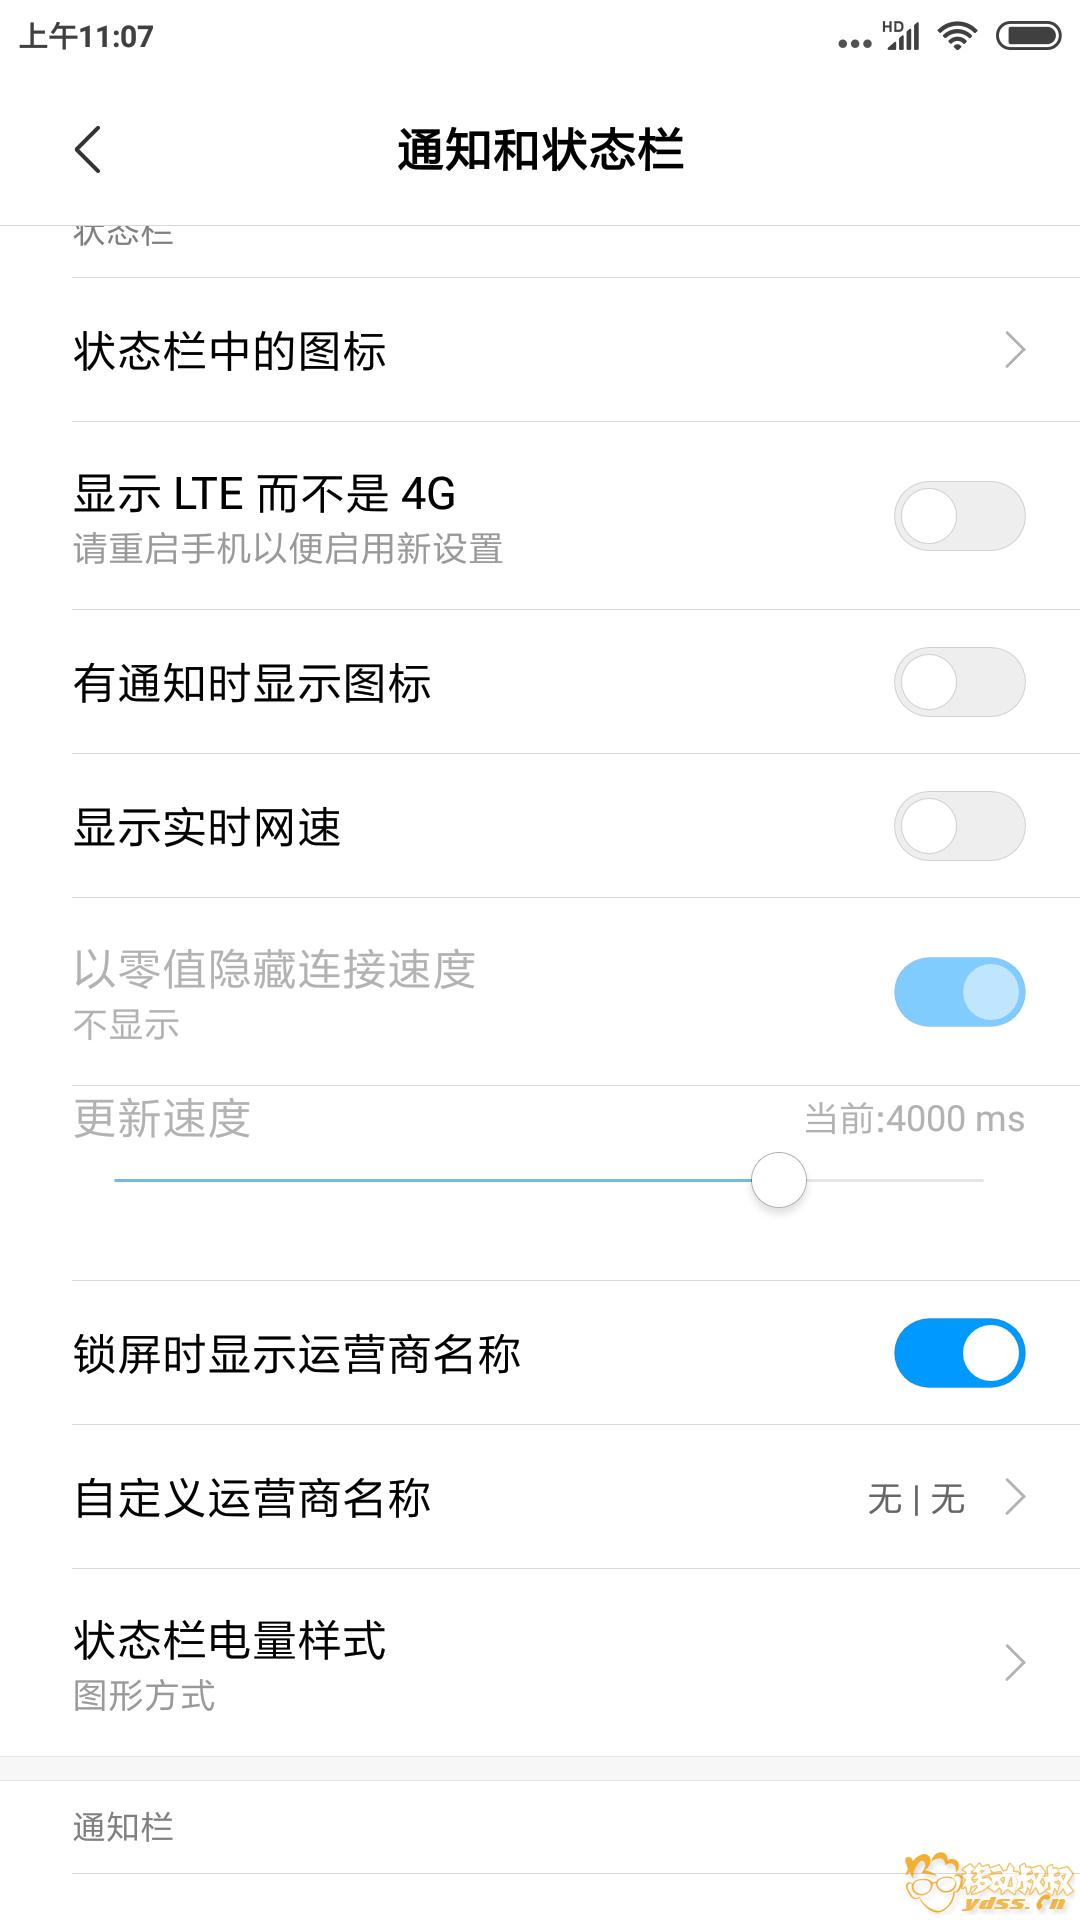 Screenshot_2018-07-02-11-07-04-366_com.android.settings.png